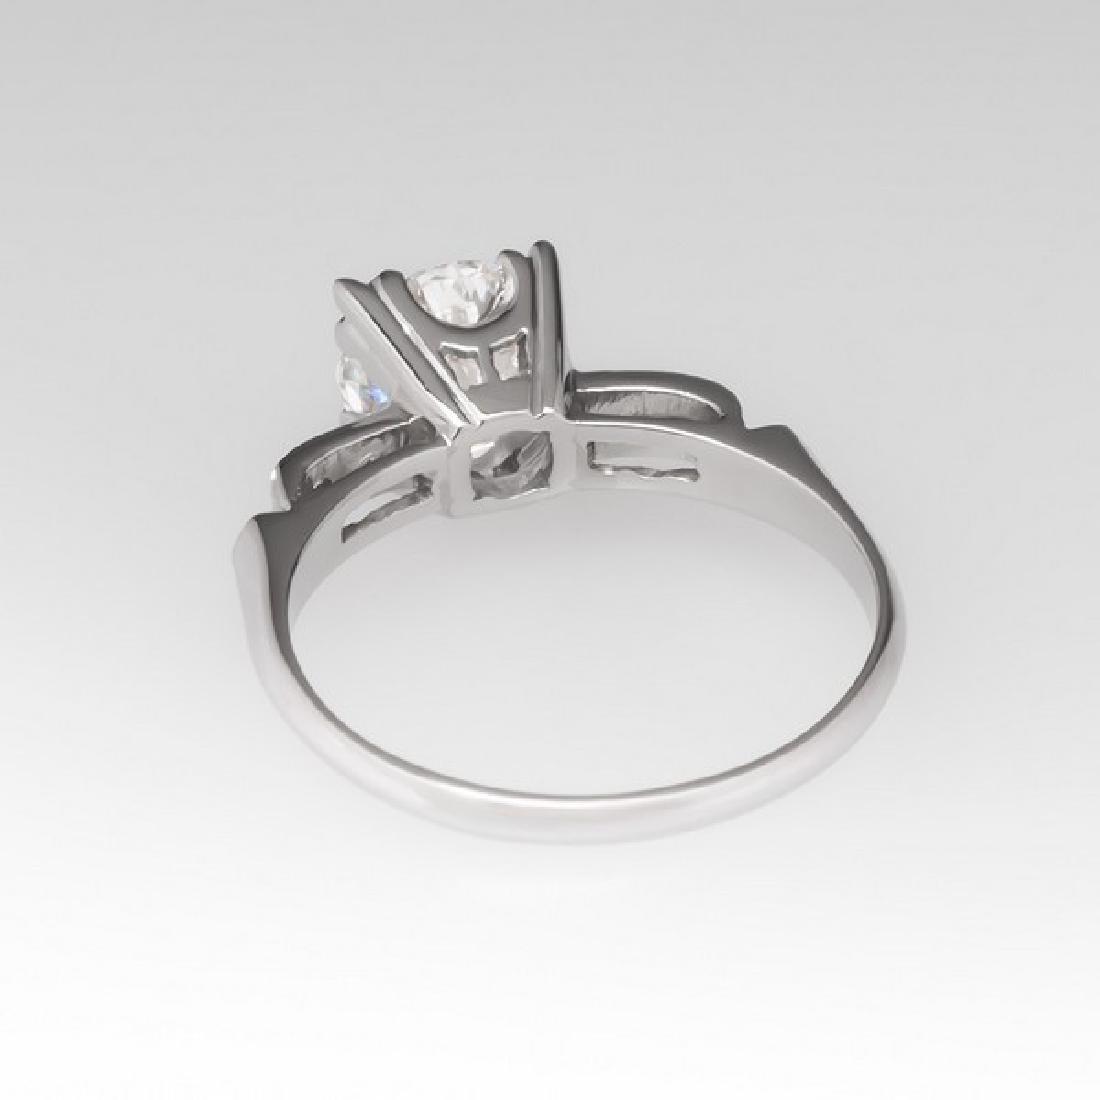 VINTAGE PLATINUM GIA DIAMOND ENGAGEMENT RING - 4